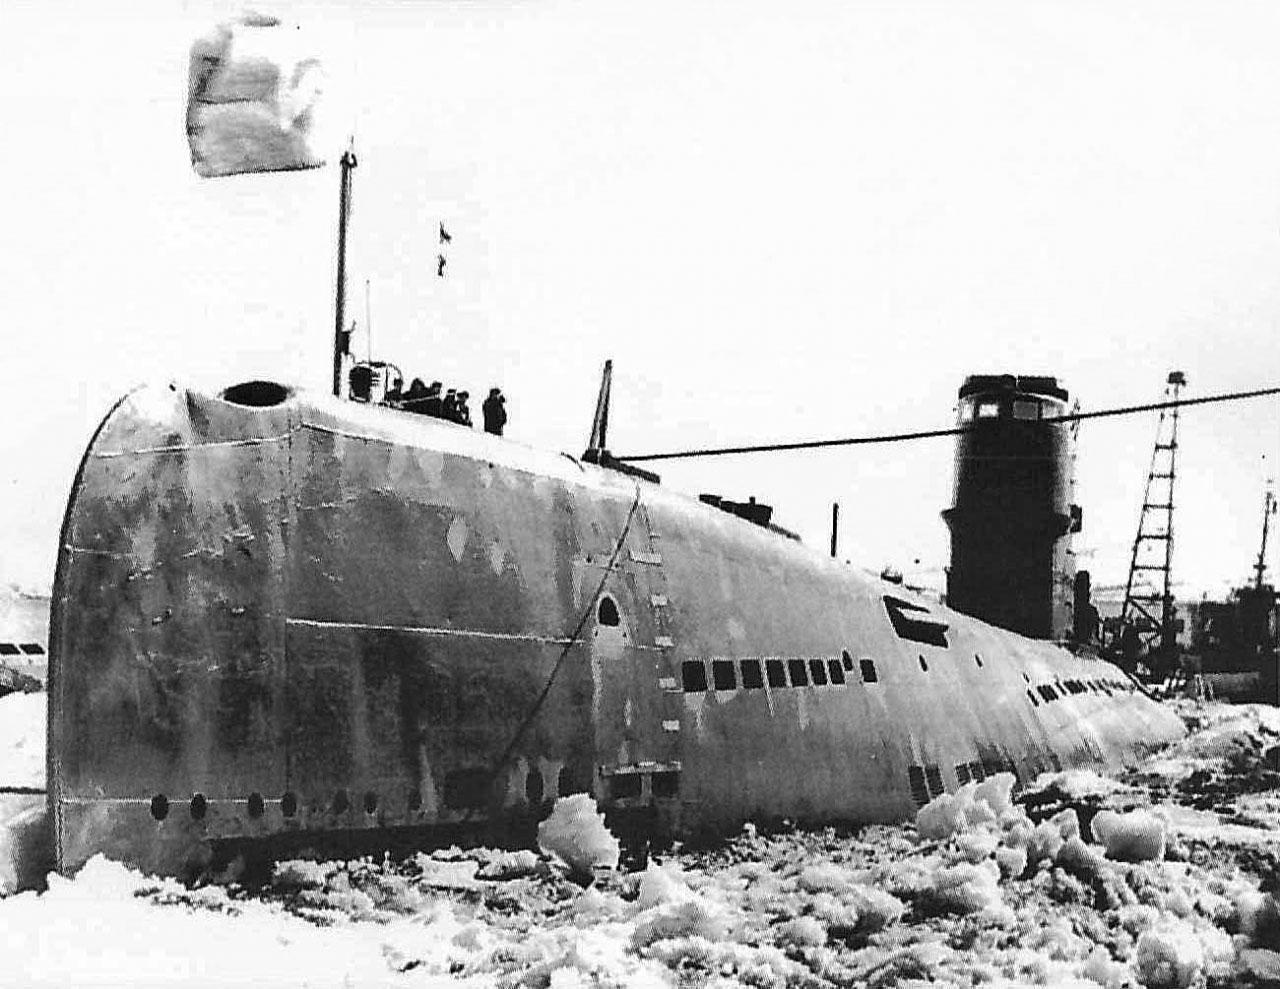 Бухта Нагаева. С-286 вмерзла в лёд.